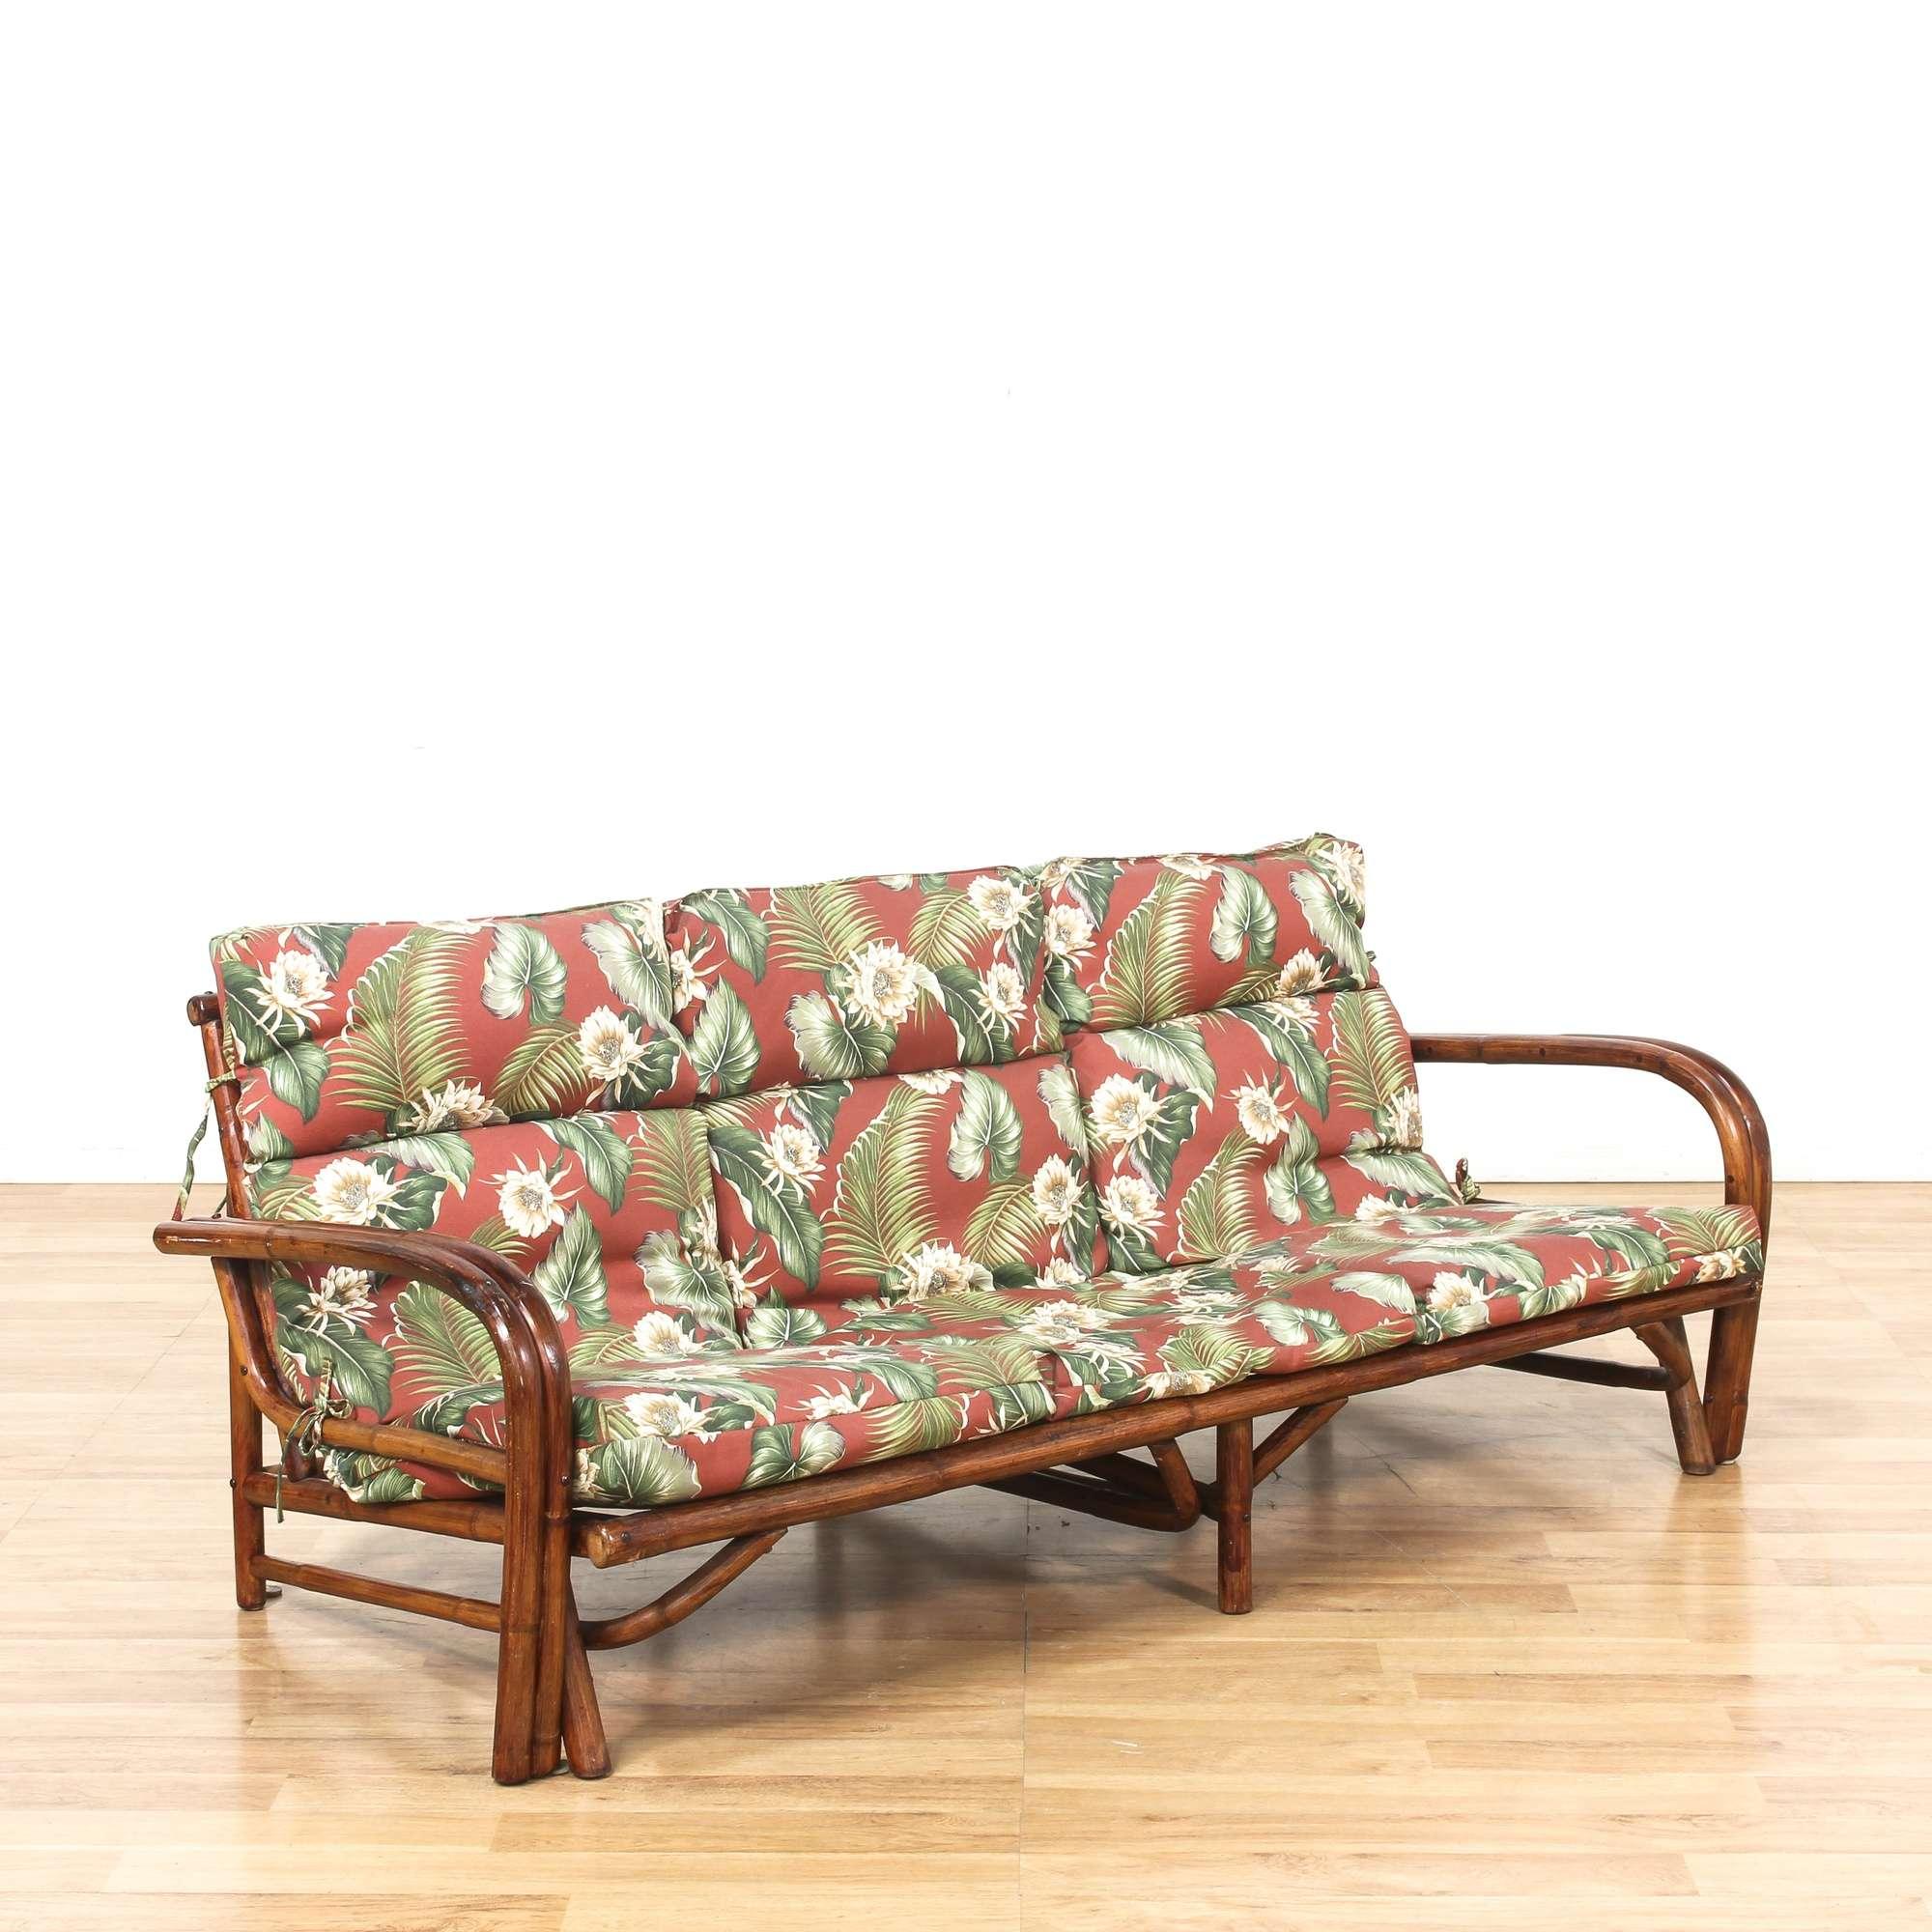 products armchairs seat grey outdoor sofa ikea en bamboo pplar sofas loveseat brown dark fr gb stained duvholmen garden